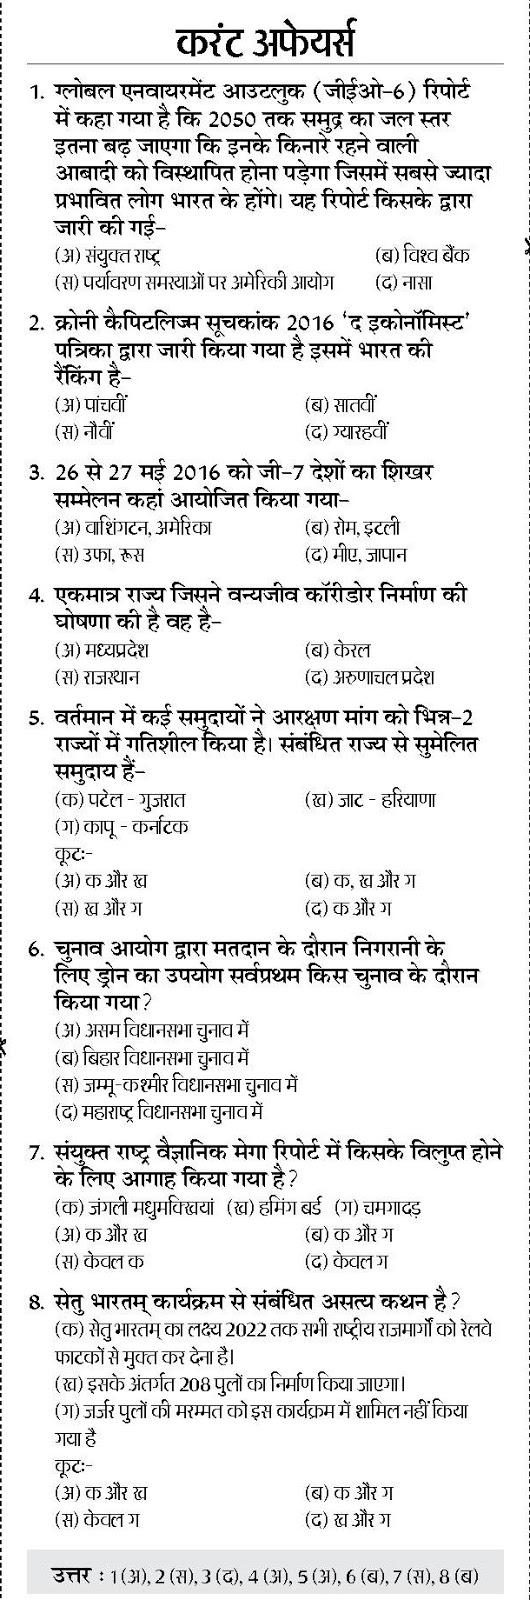 computer gk in hindi pdf free download 2014